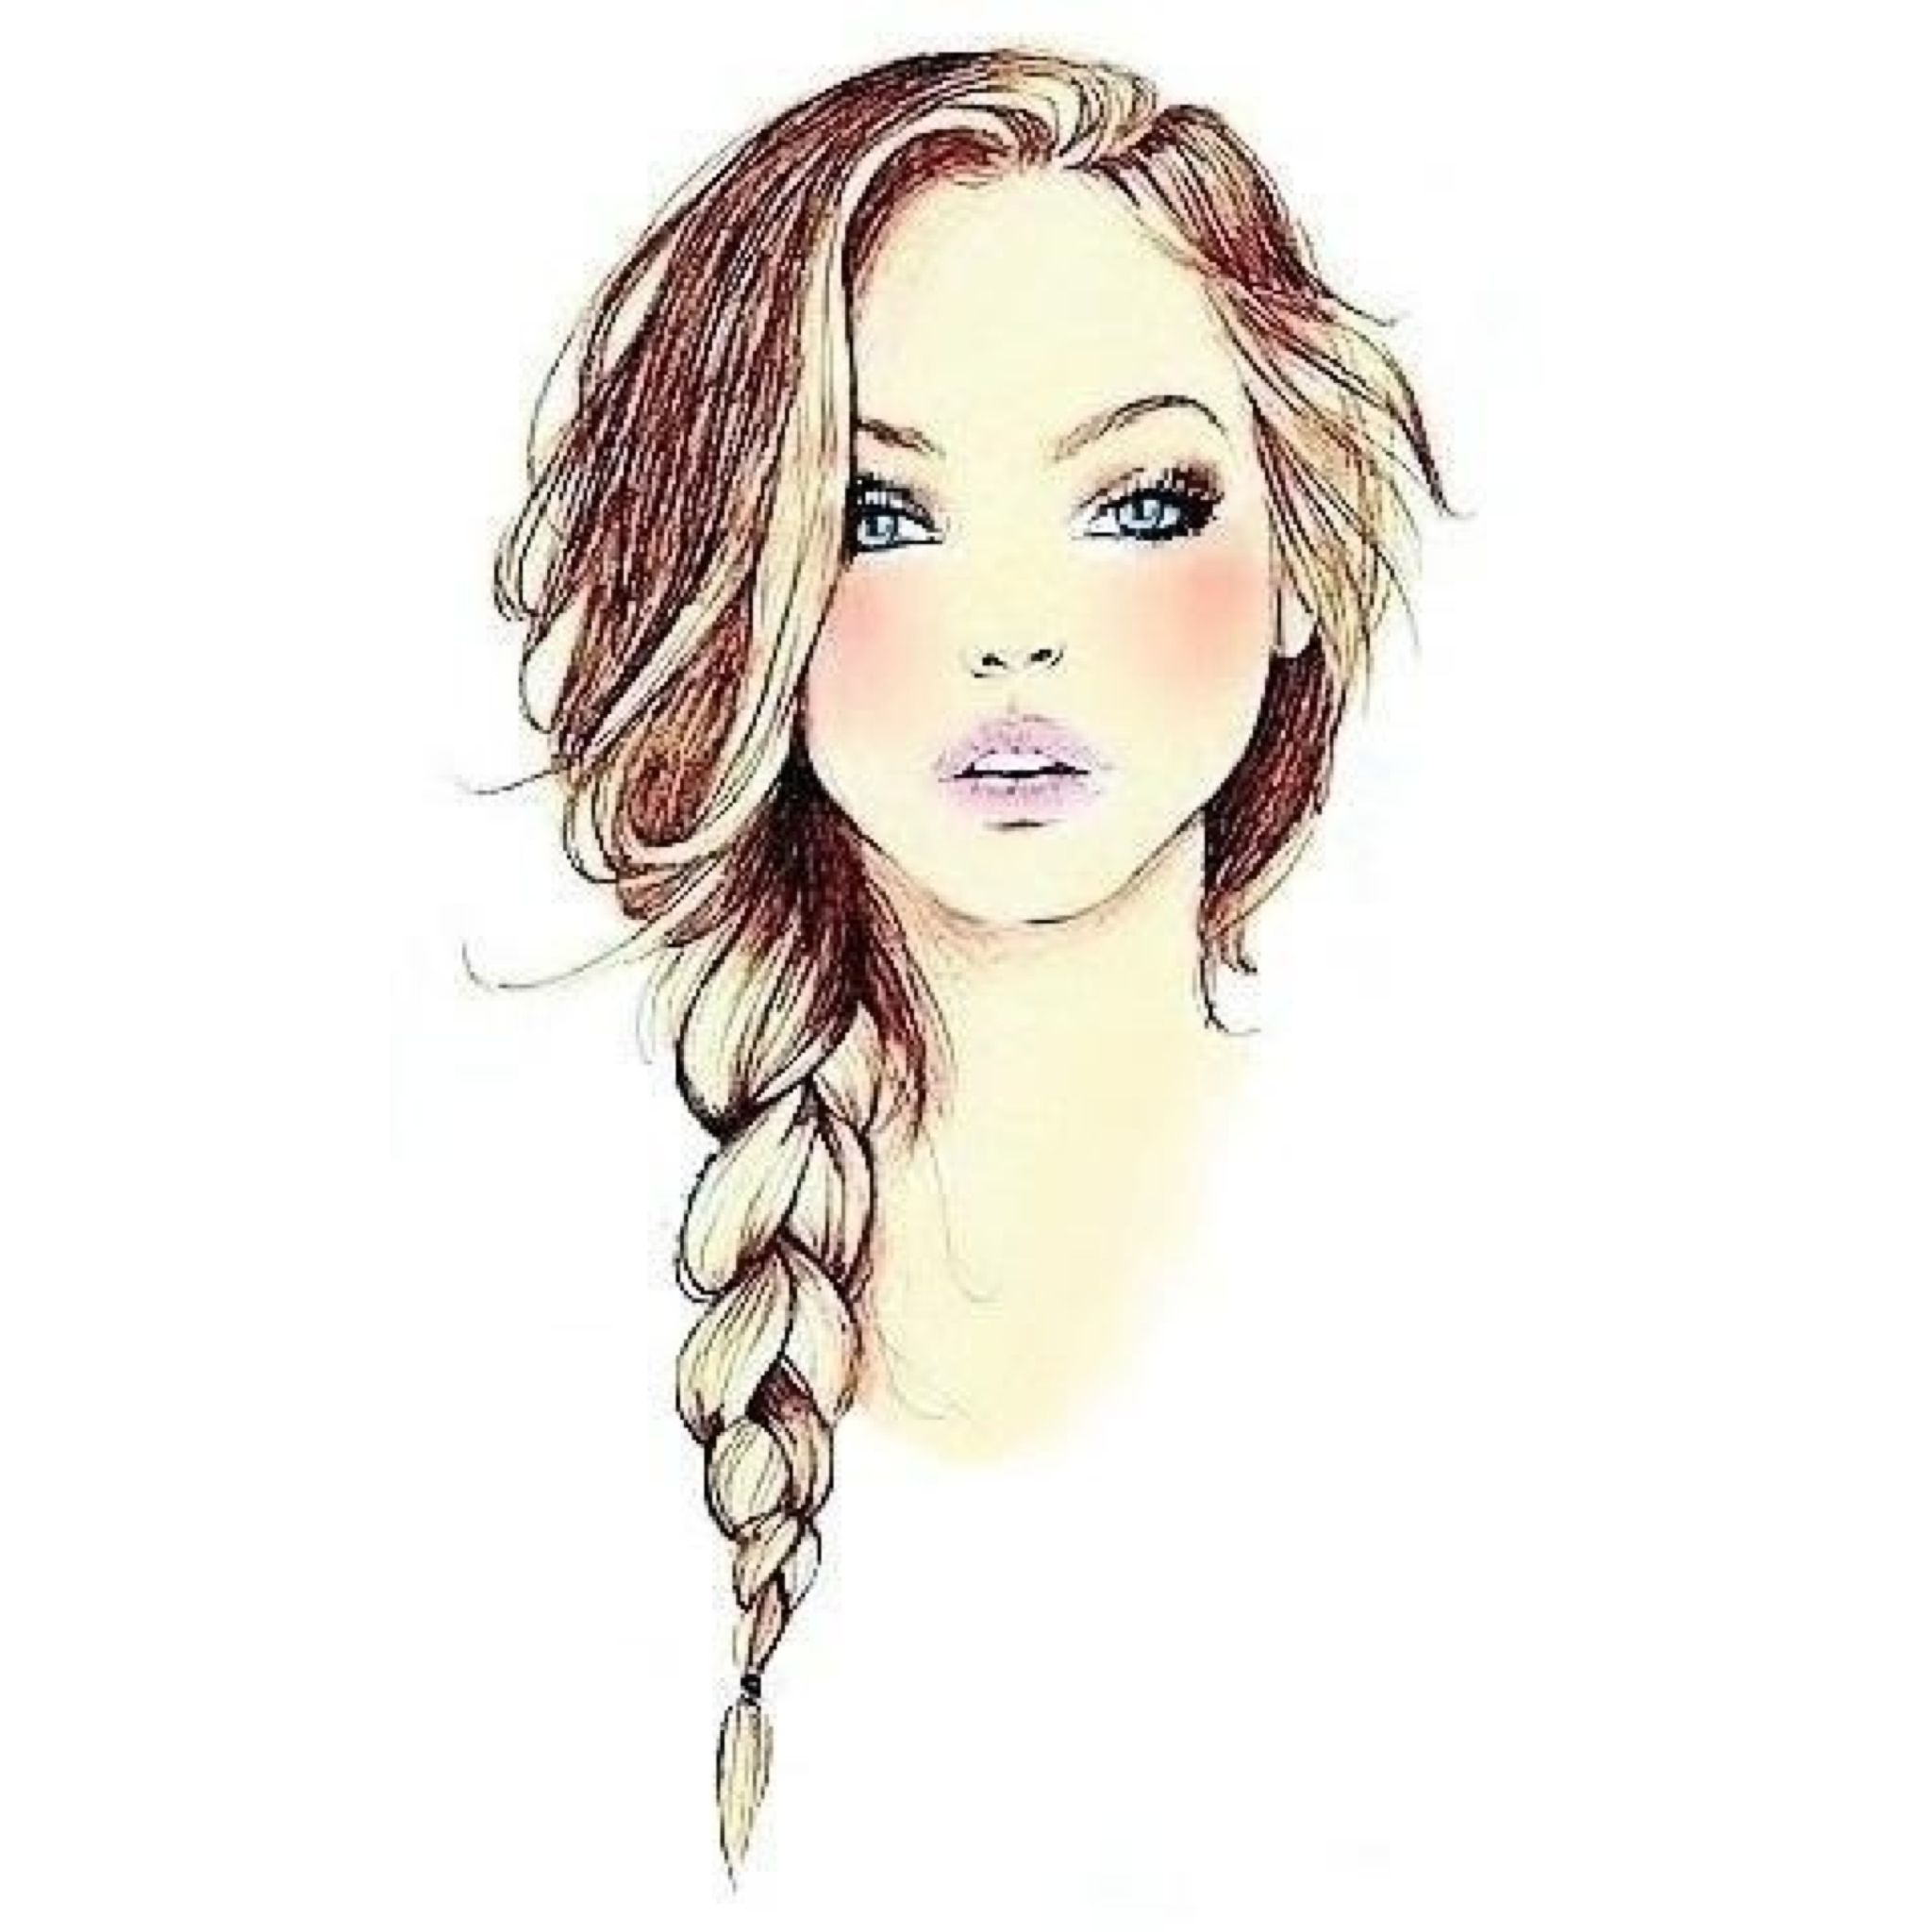 2048x2048 Braided Hair Drawing Draw Girl With Braids Beautiful